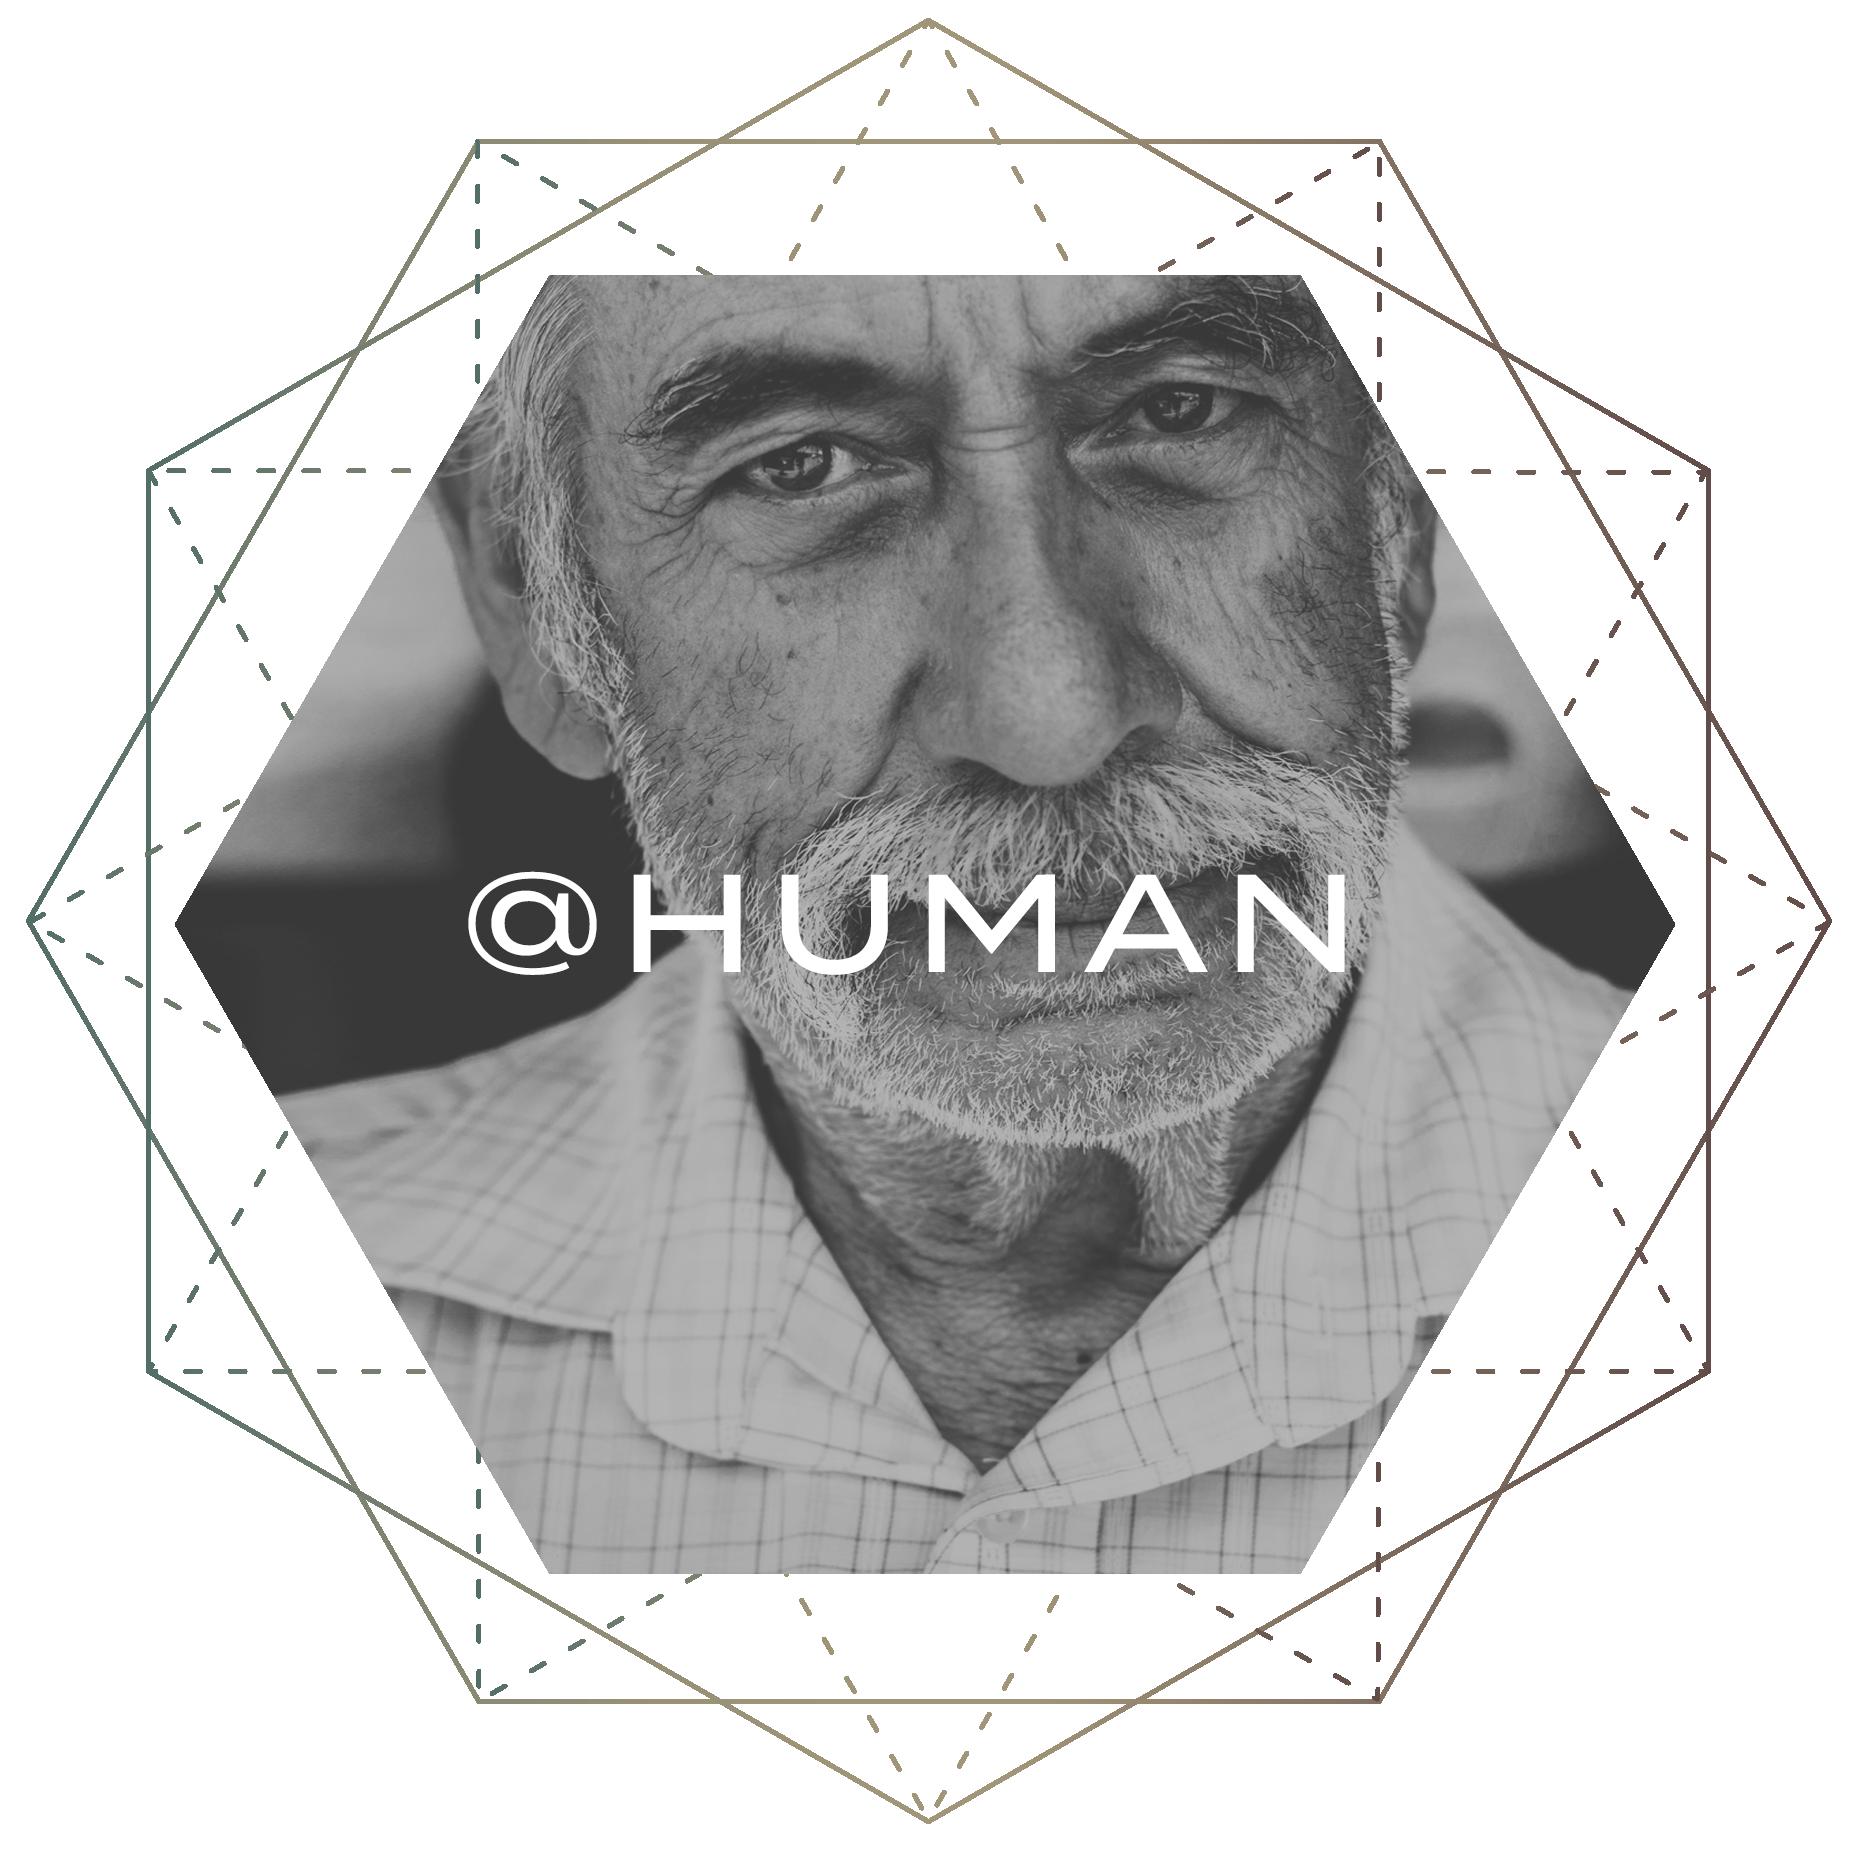 Humans-2